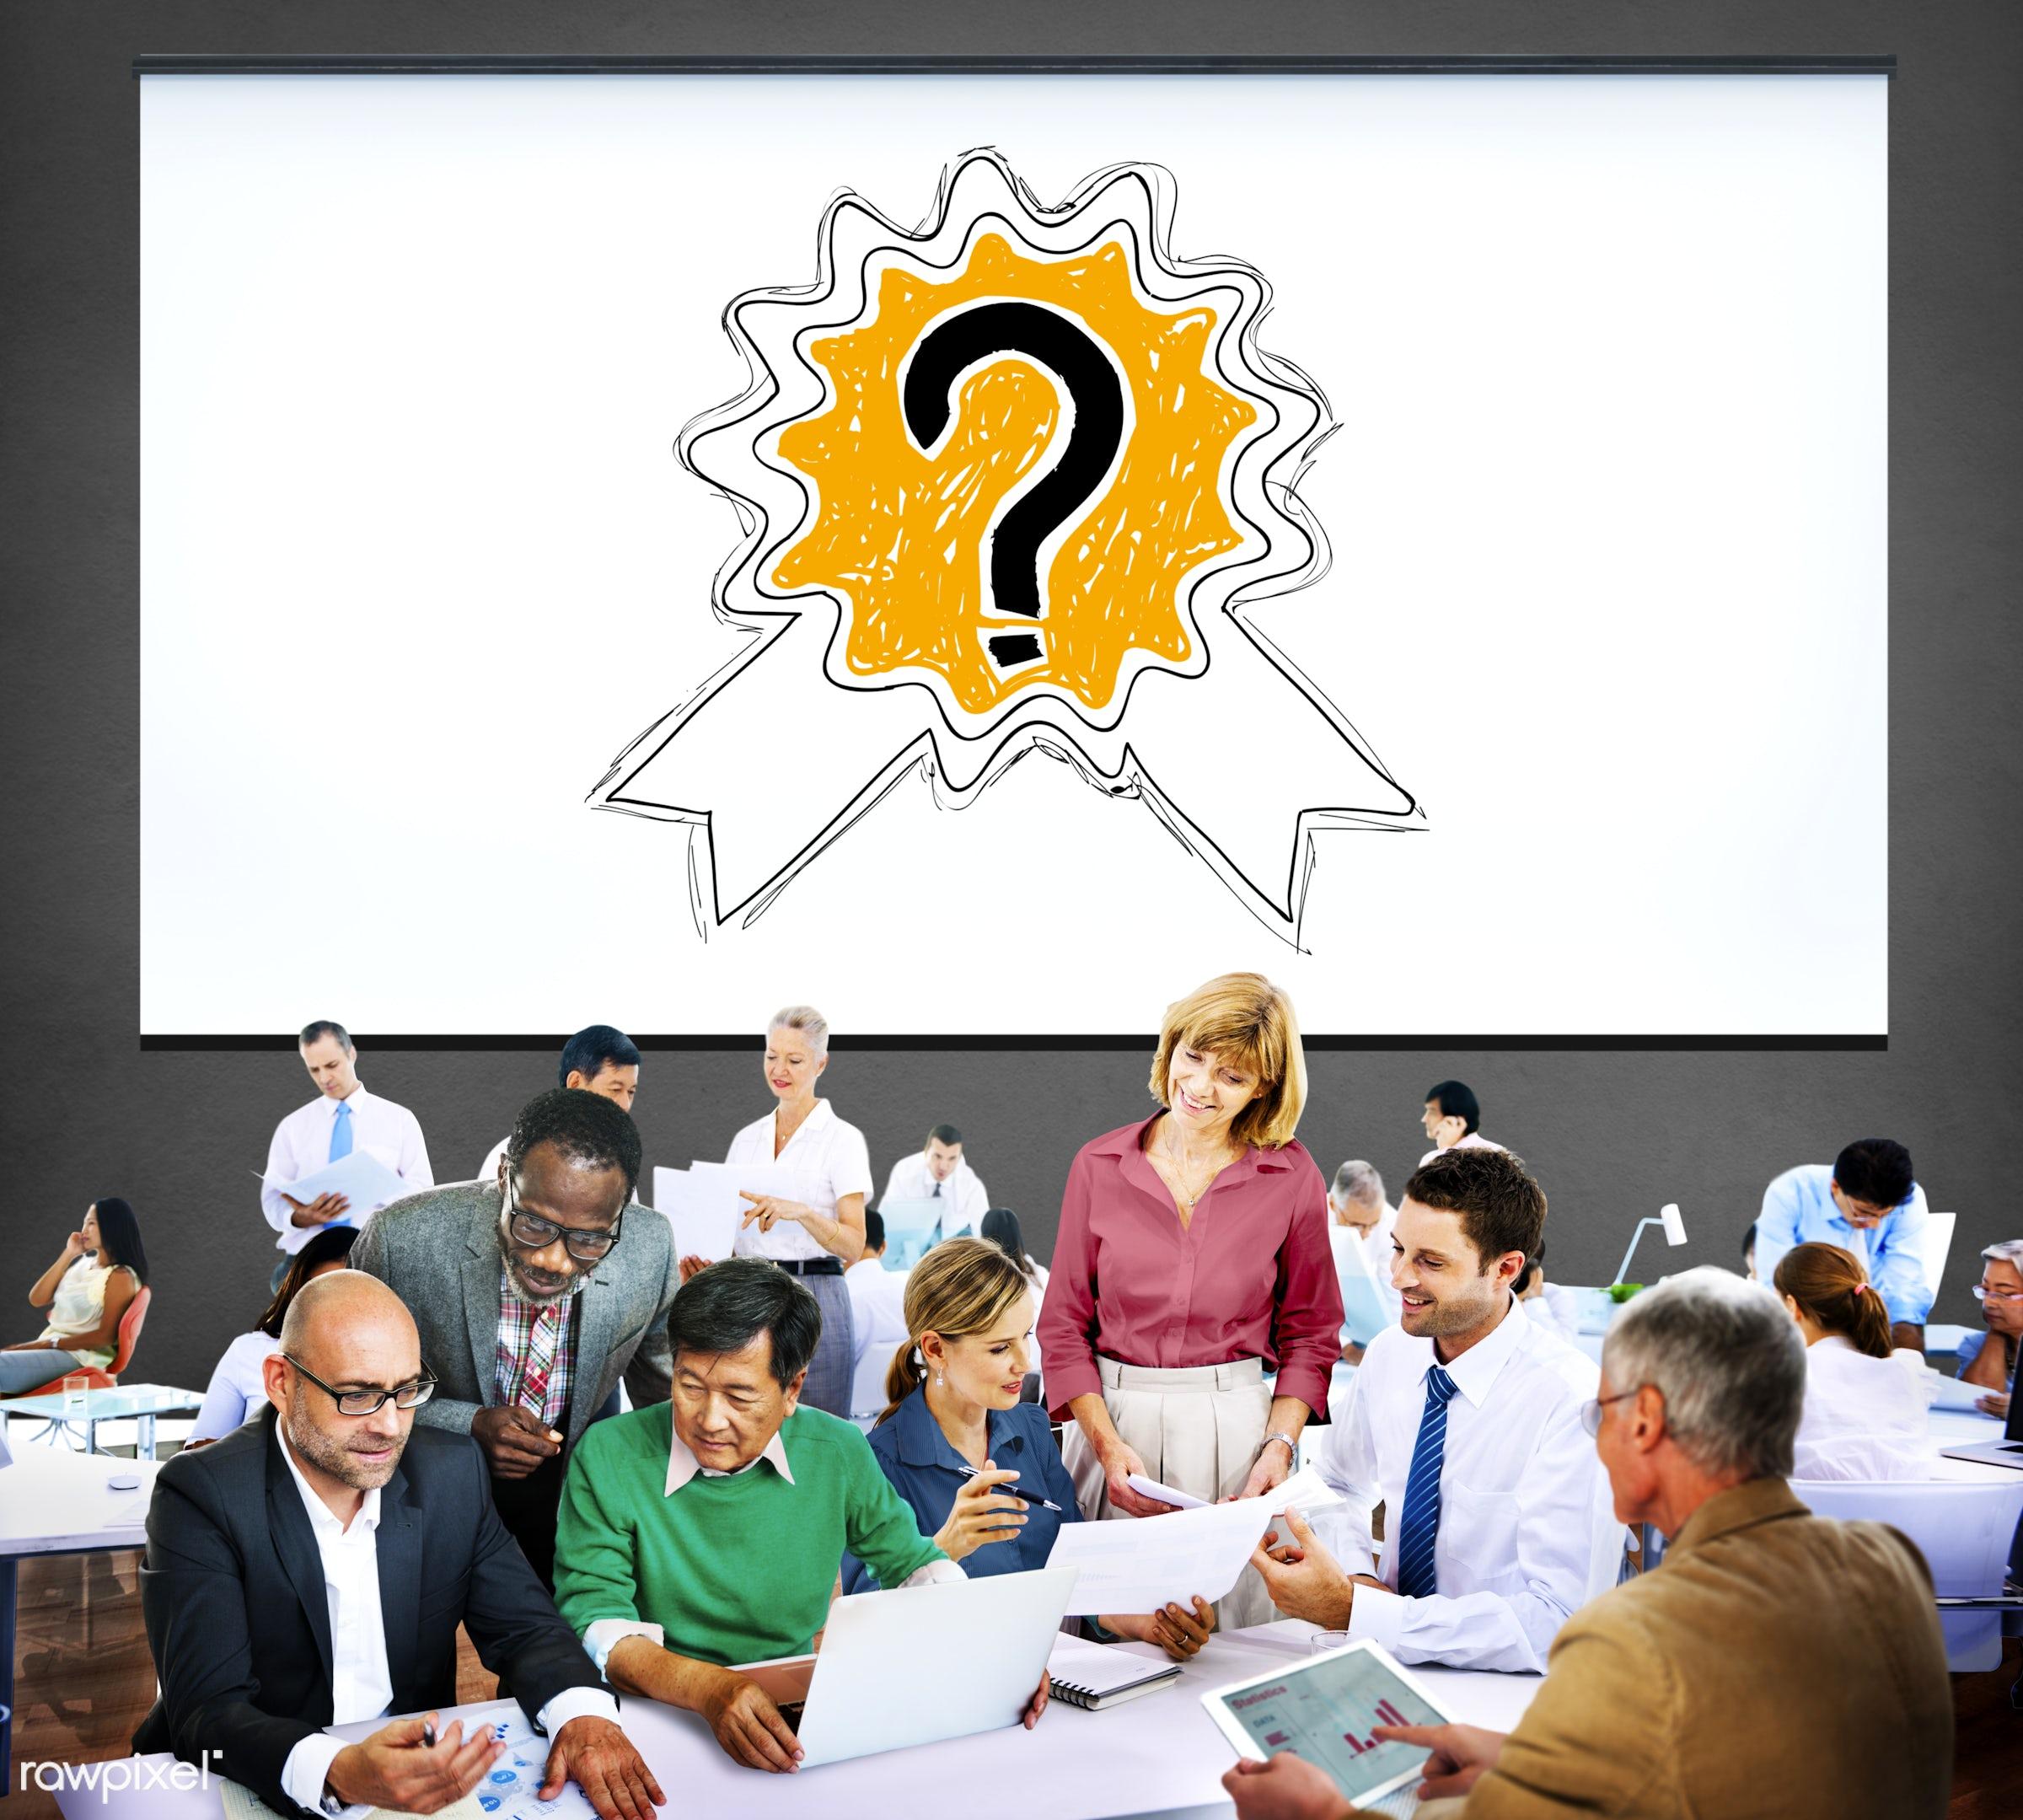 achievement, analysis, award, badge, business, business people, businessmen, businesswomen, busy, challenge, champion,...